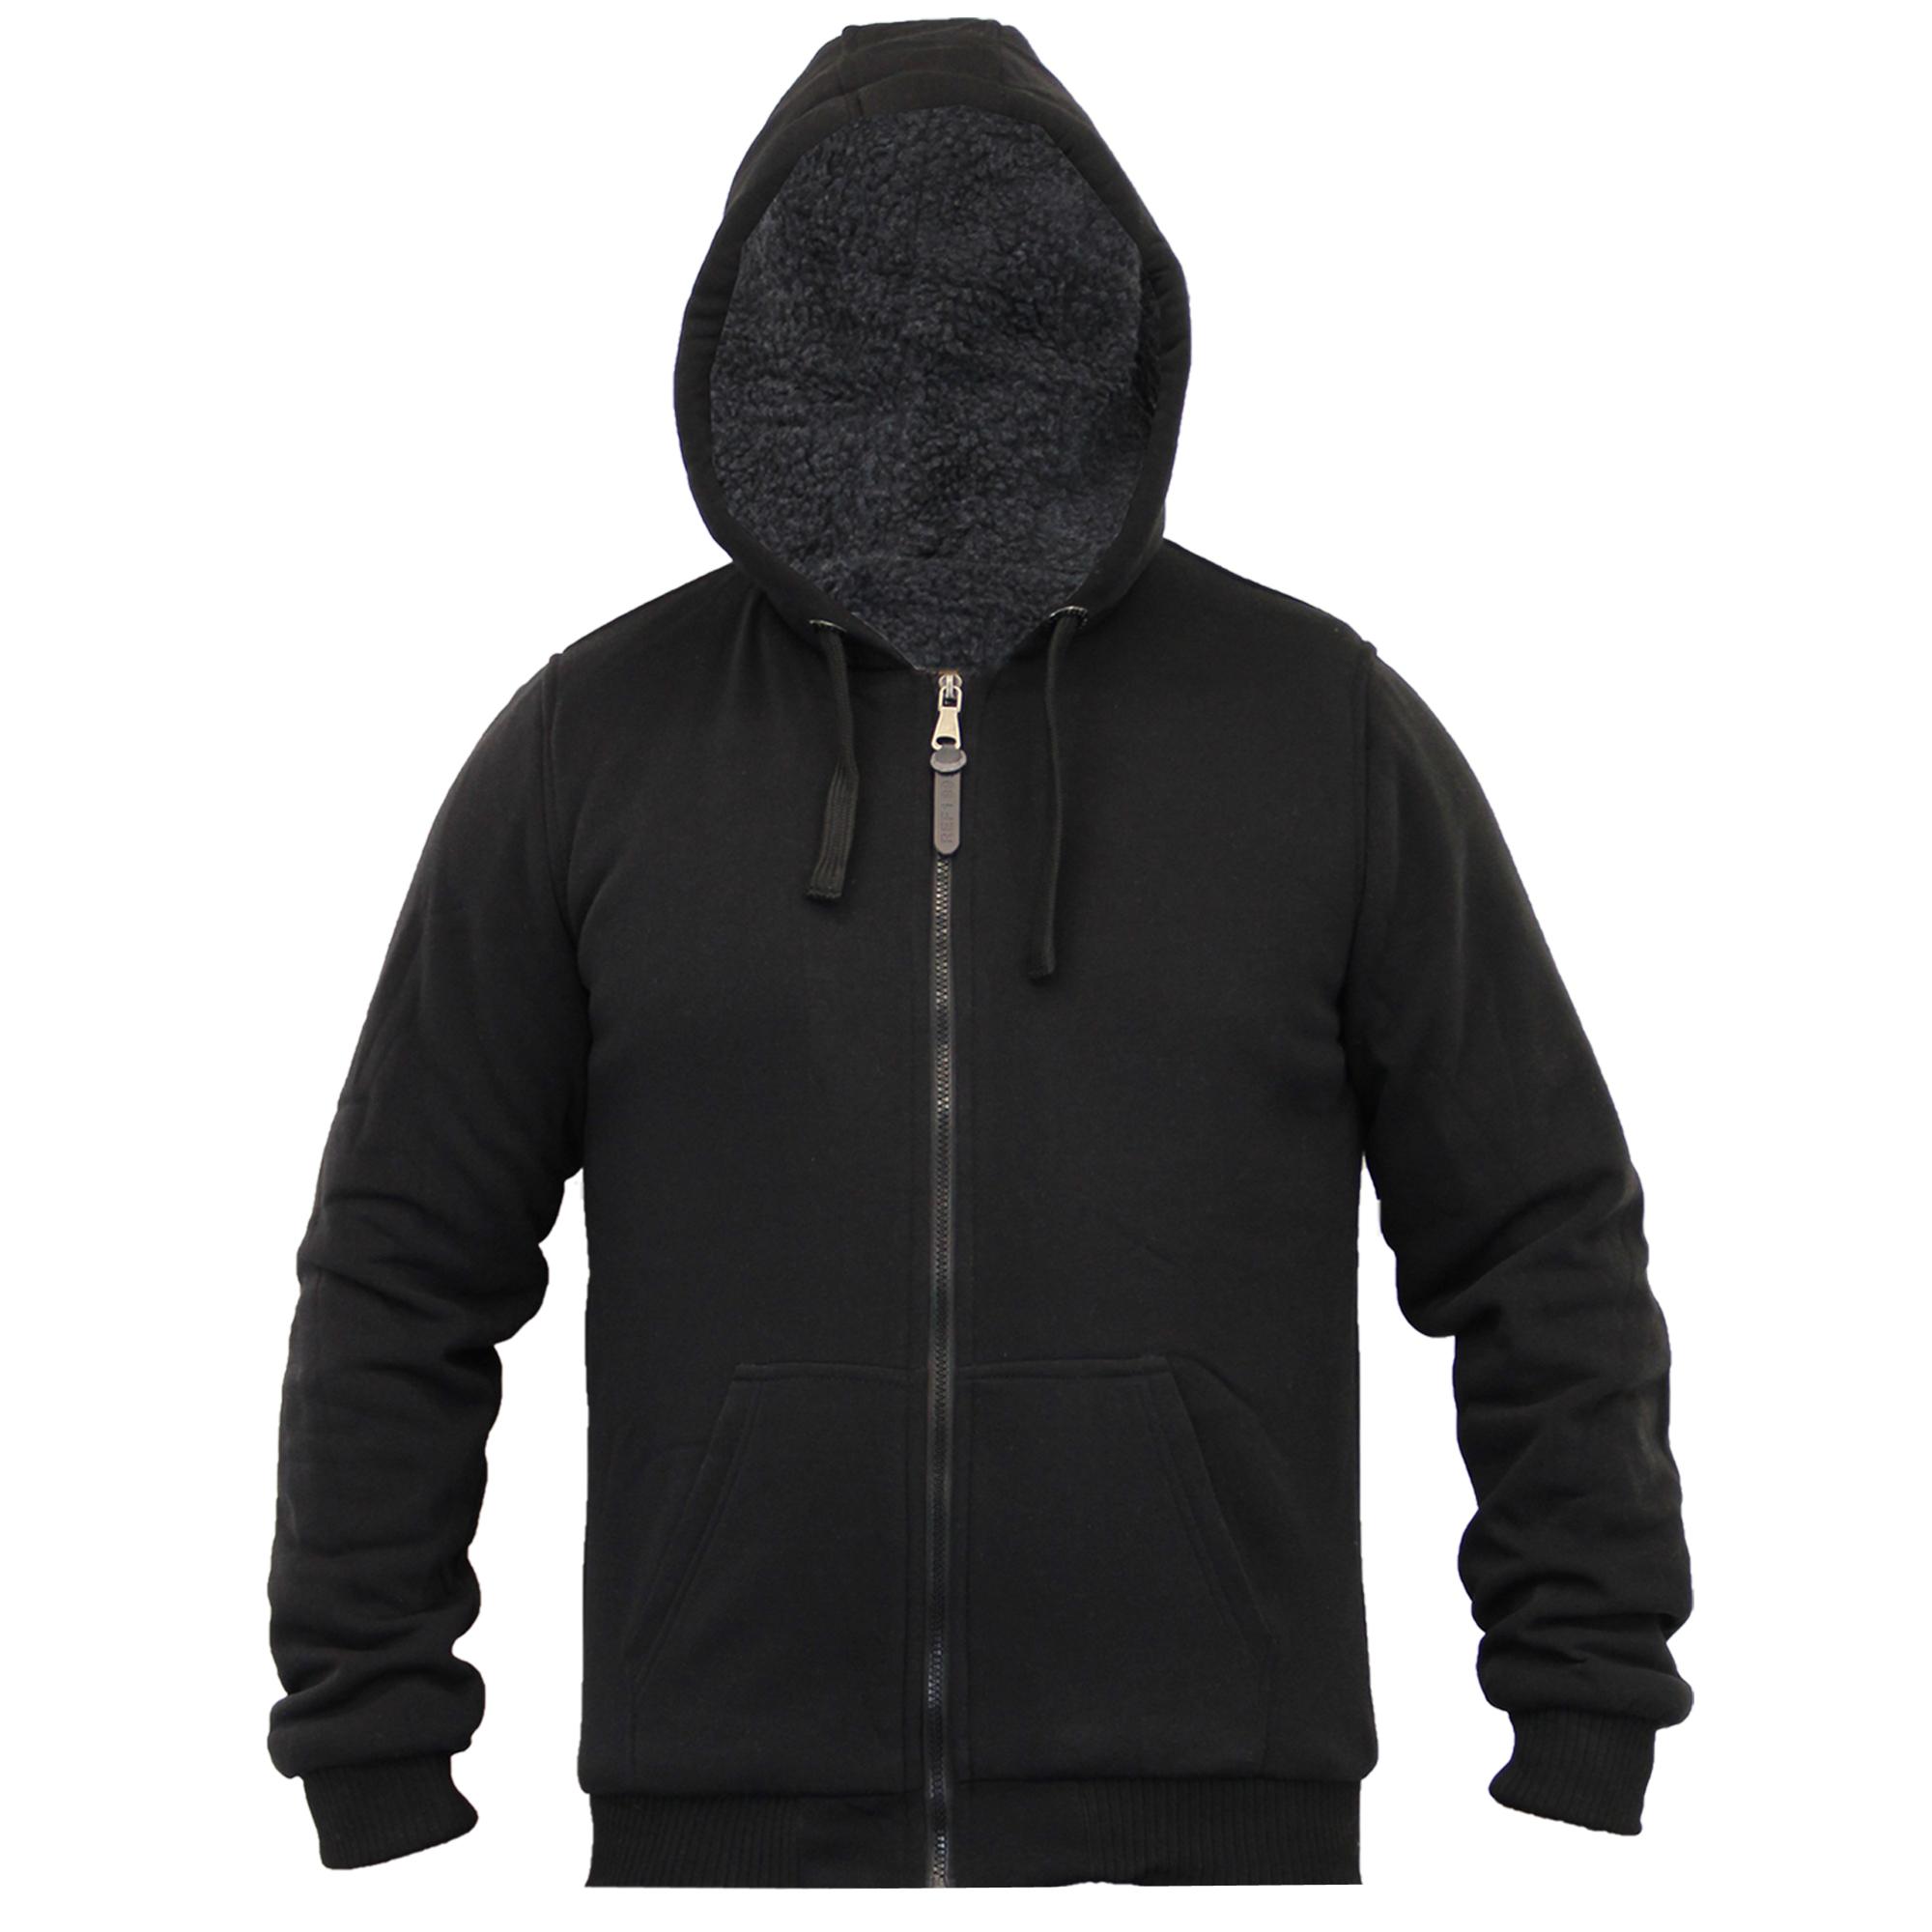 Mens Jacket Brave Soul Sweat Coat Hoodie Top Sherpa Fleece